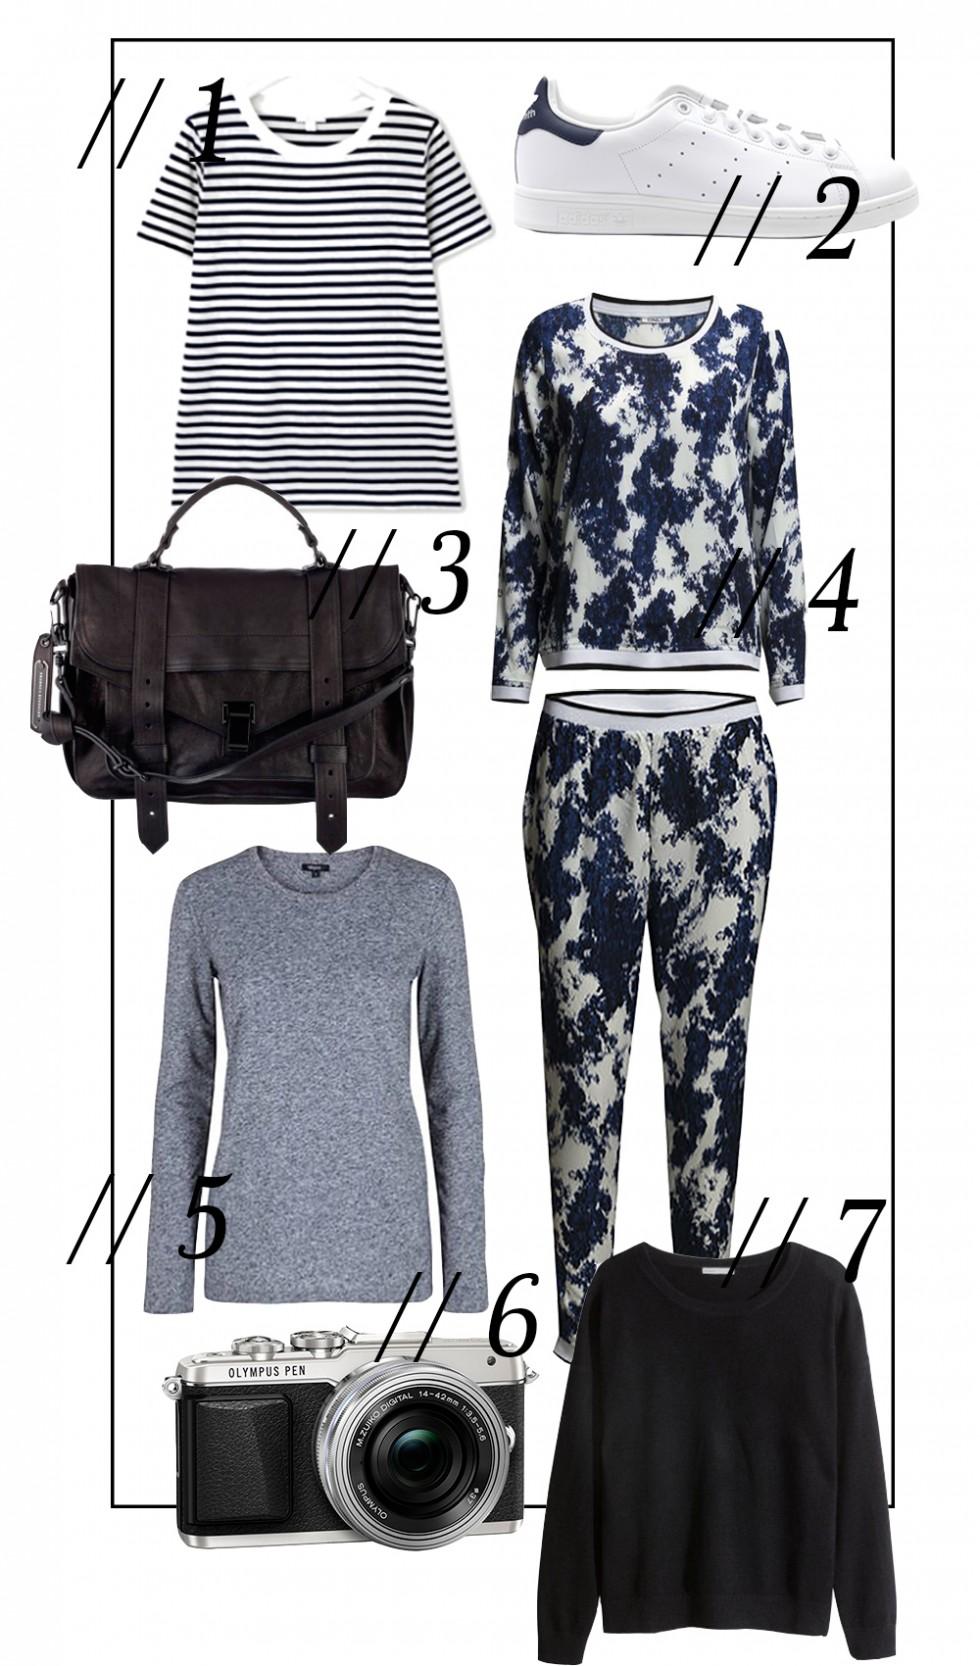 q1-shopping